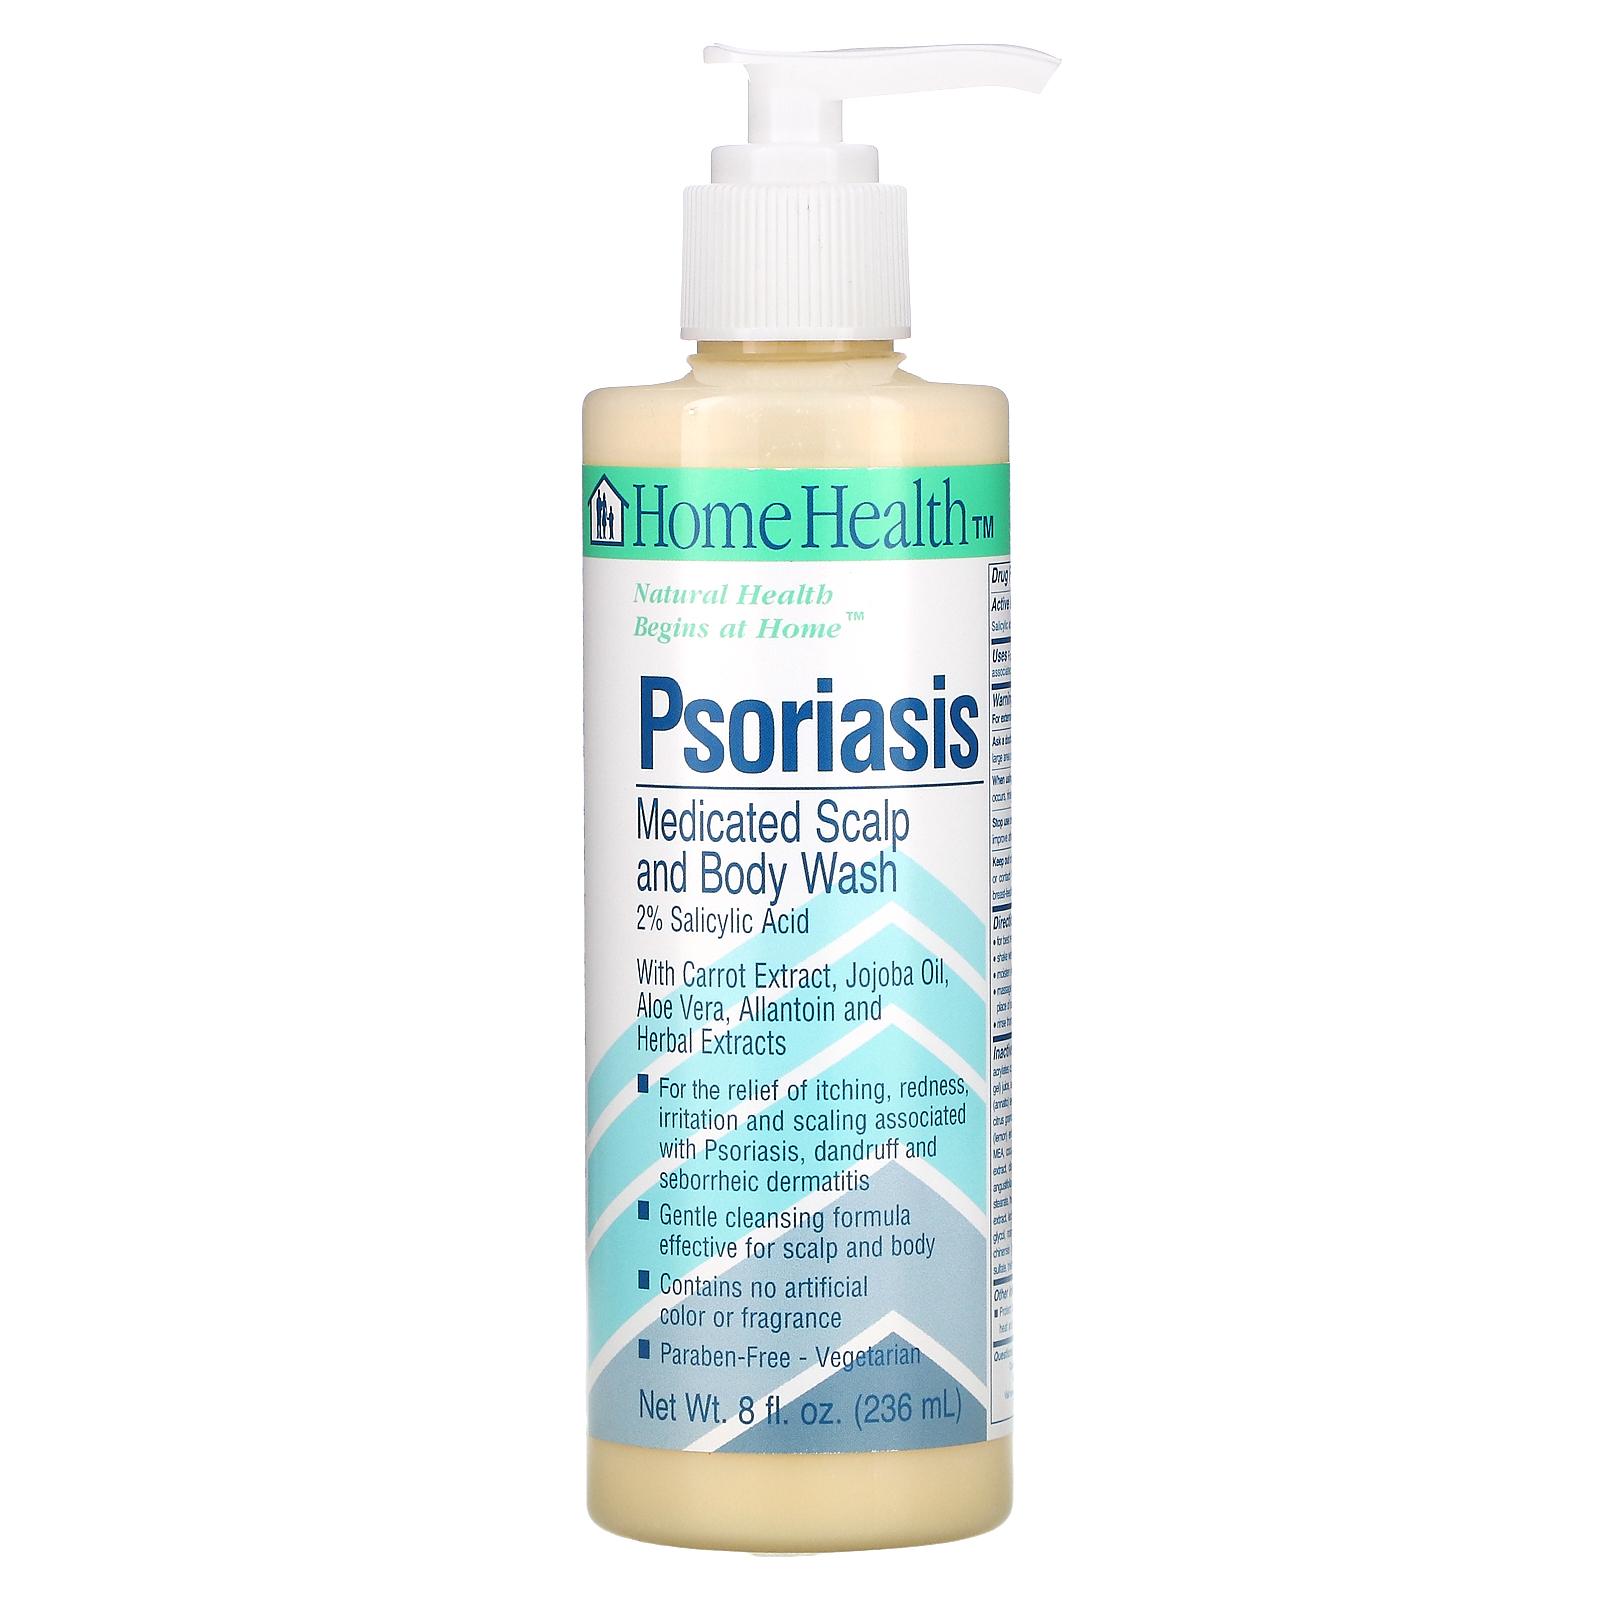 home health psoriasis scalp body wash száraz bőr és vörös foltok